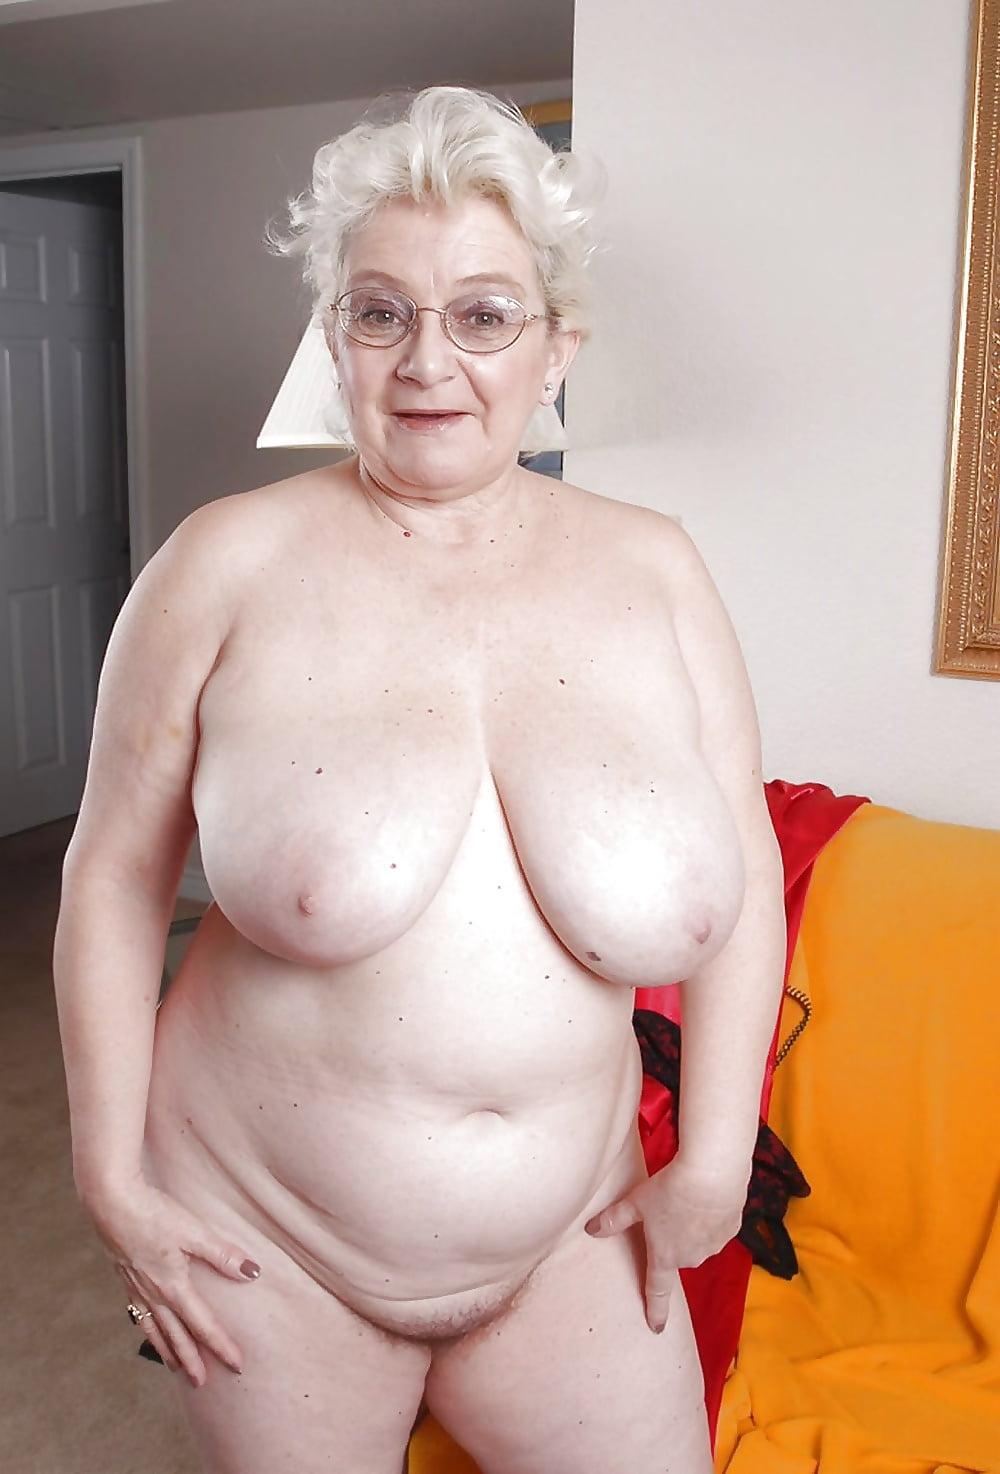 bengali-granny-nude-sabrina-the-witch-nude